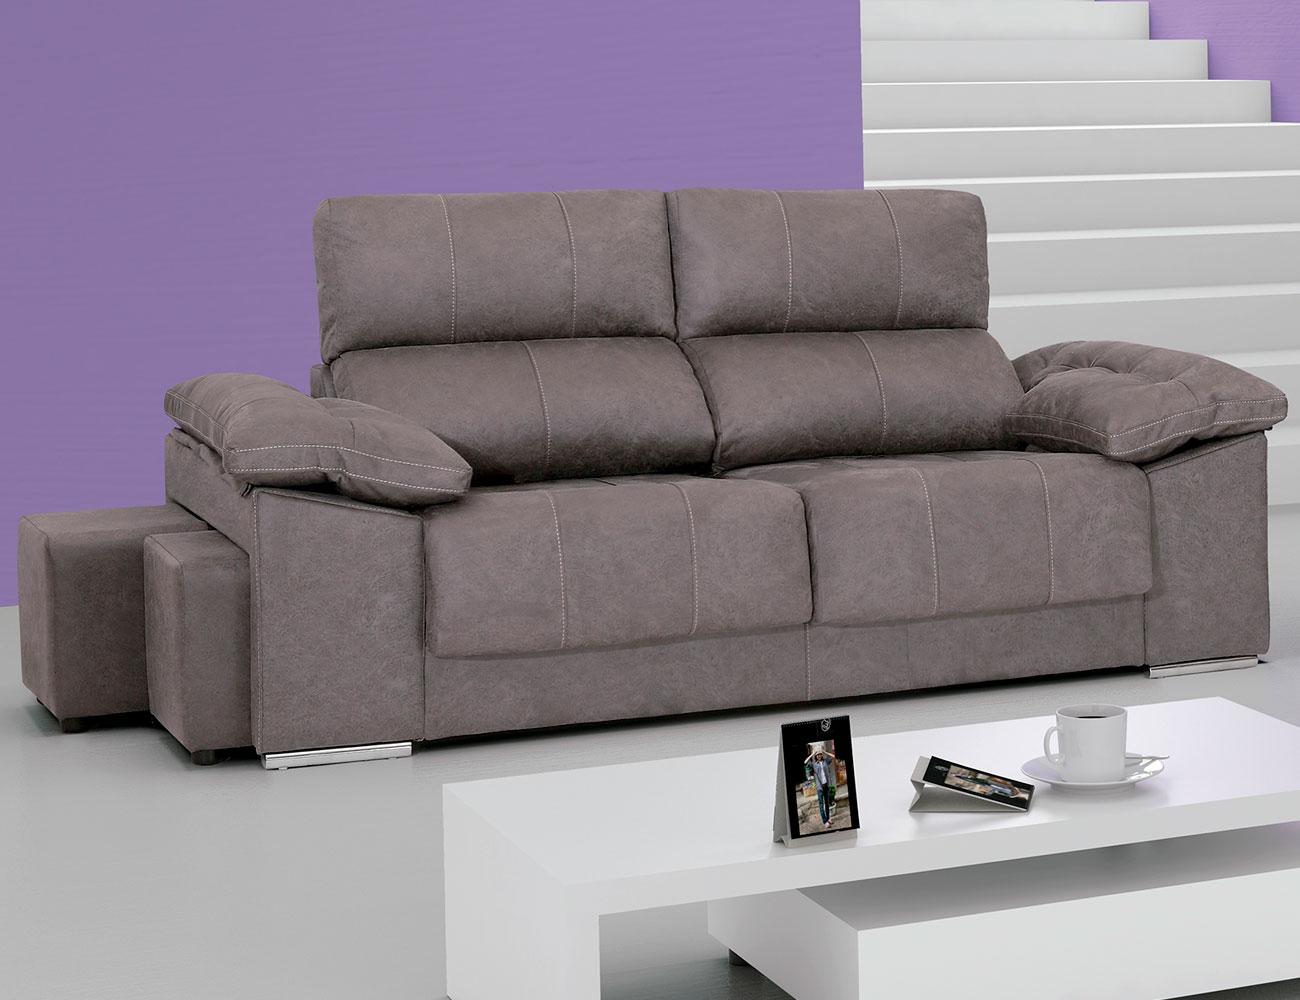 Sof con asientos extra bles y respaldos reclinables 215 for Sofas de 3 plazas